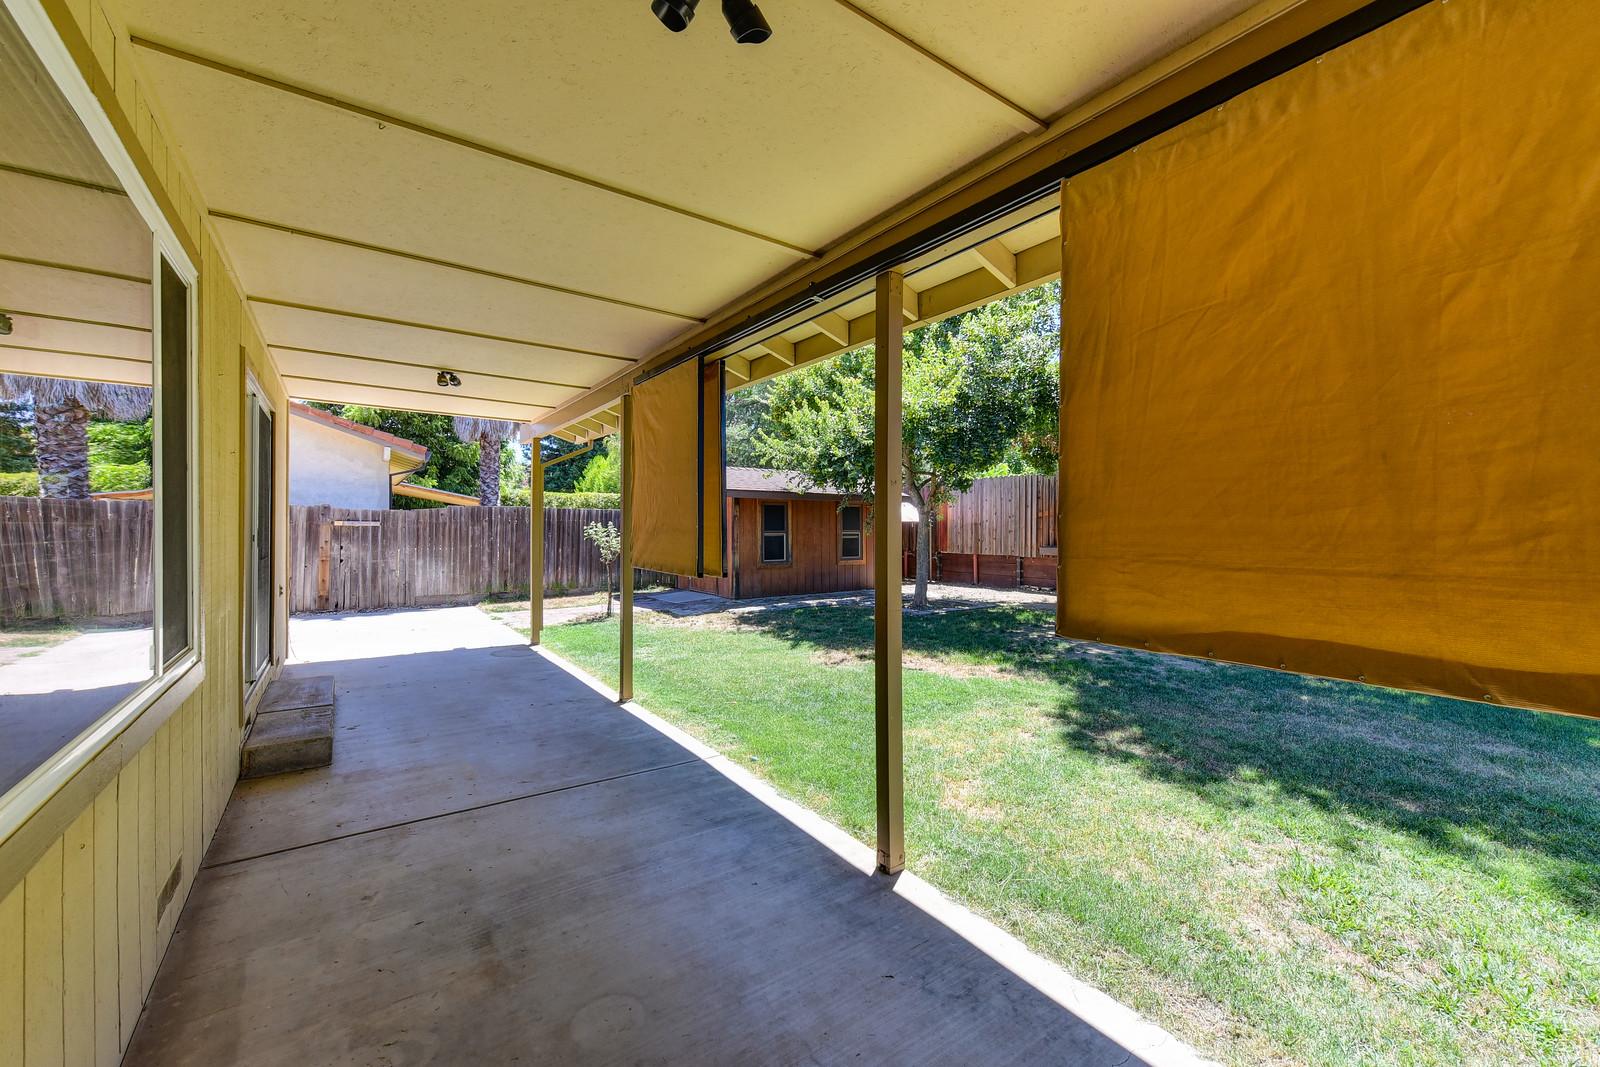 5342 Nyoda Way patio | Realtor in Carmichael California